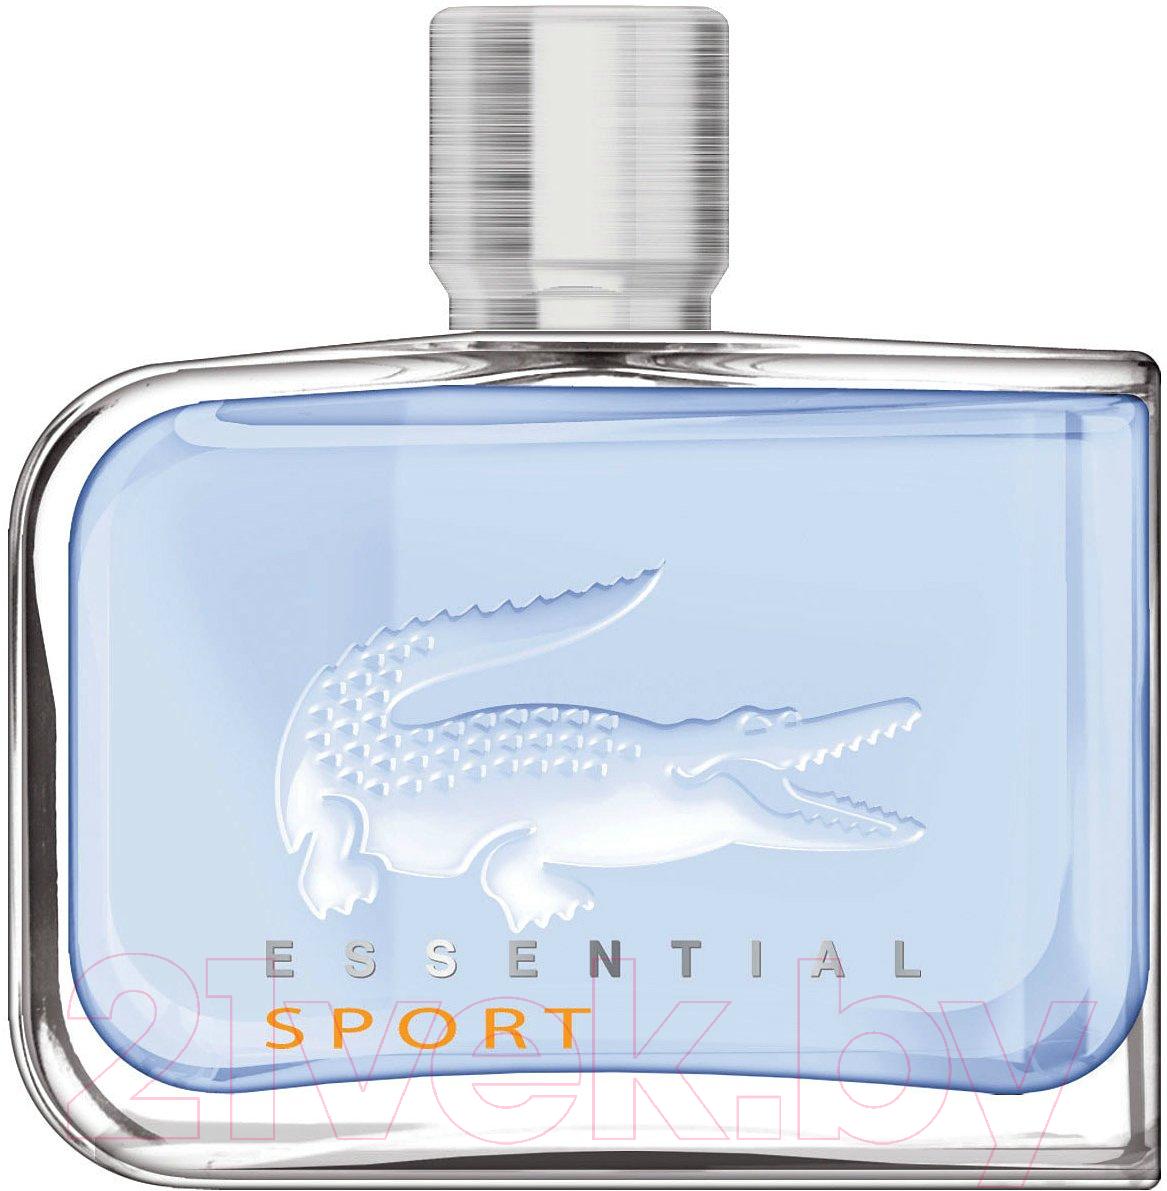 Купить Туалетная вода Lacoste, Essential Sport (75мл), Швейцария, Essential (Lacoste)